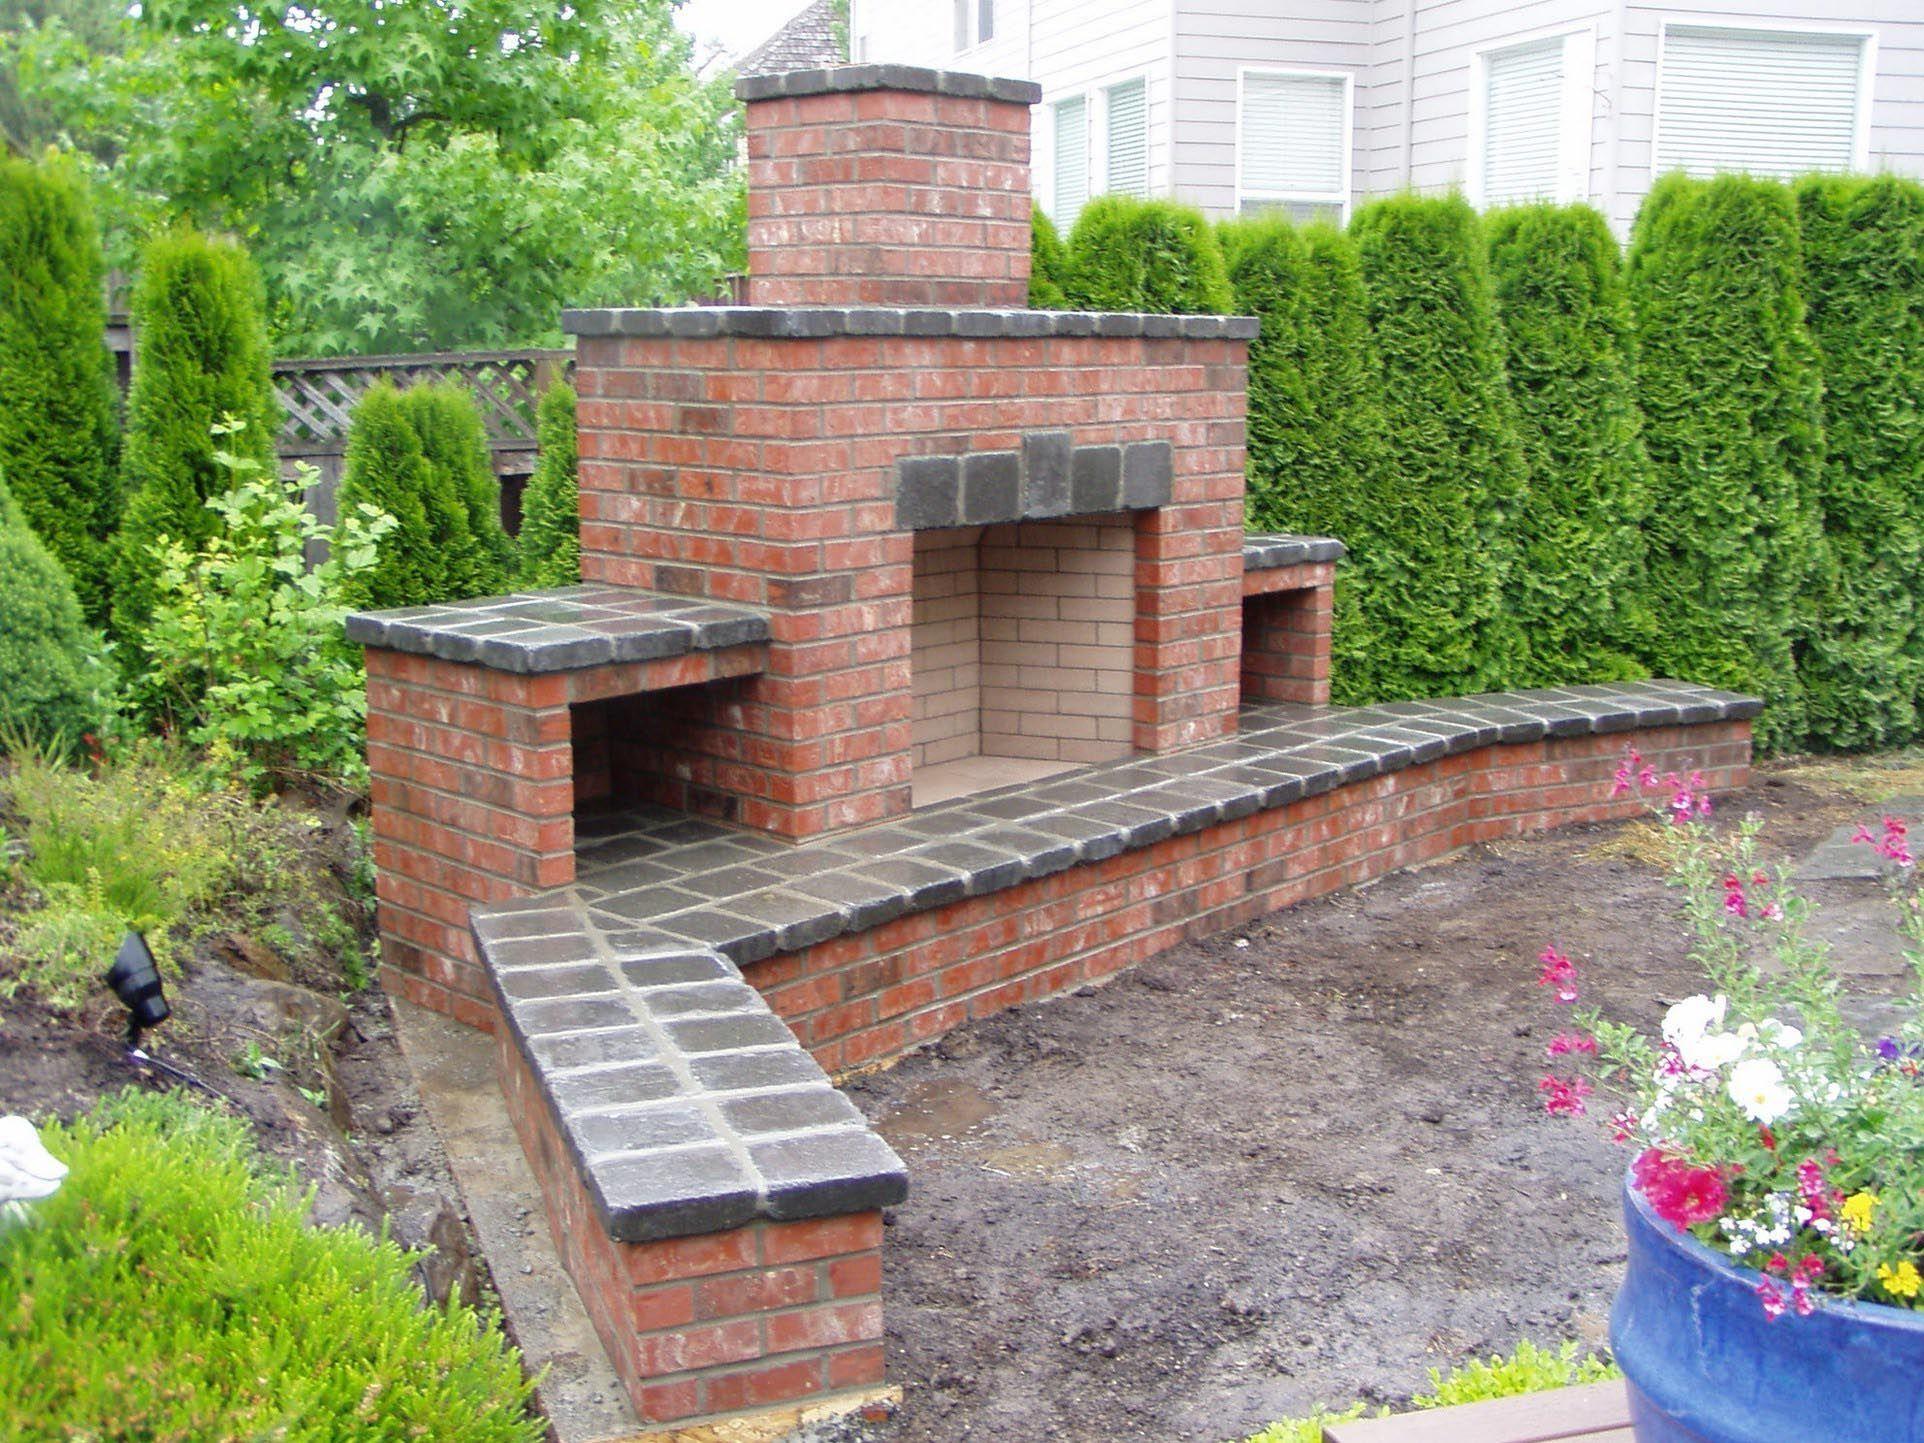 Red Brick Outdoor Fireplace Diy Outdoor Fireplace Outdoor Fireplace Plans Red Brick Fireplaces